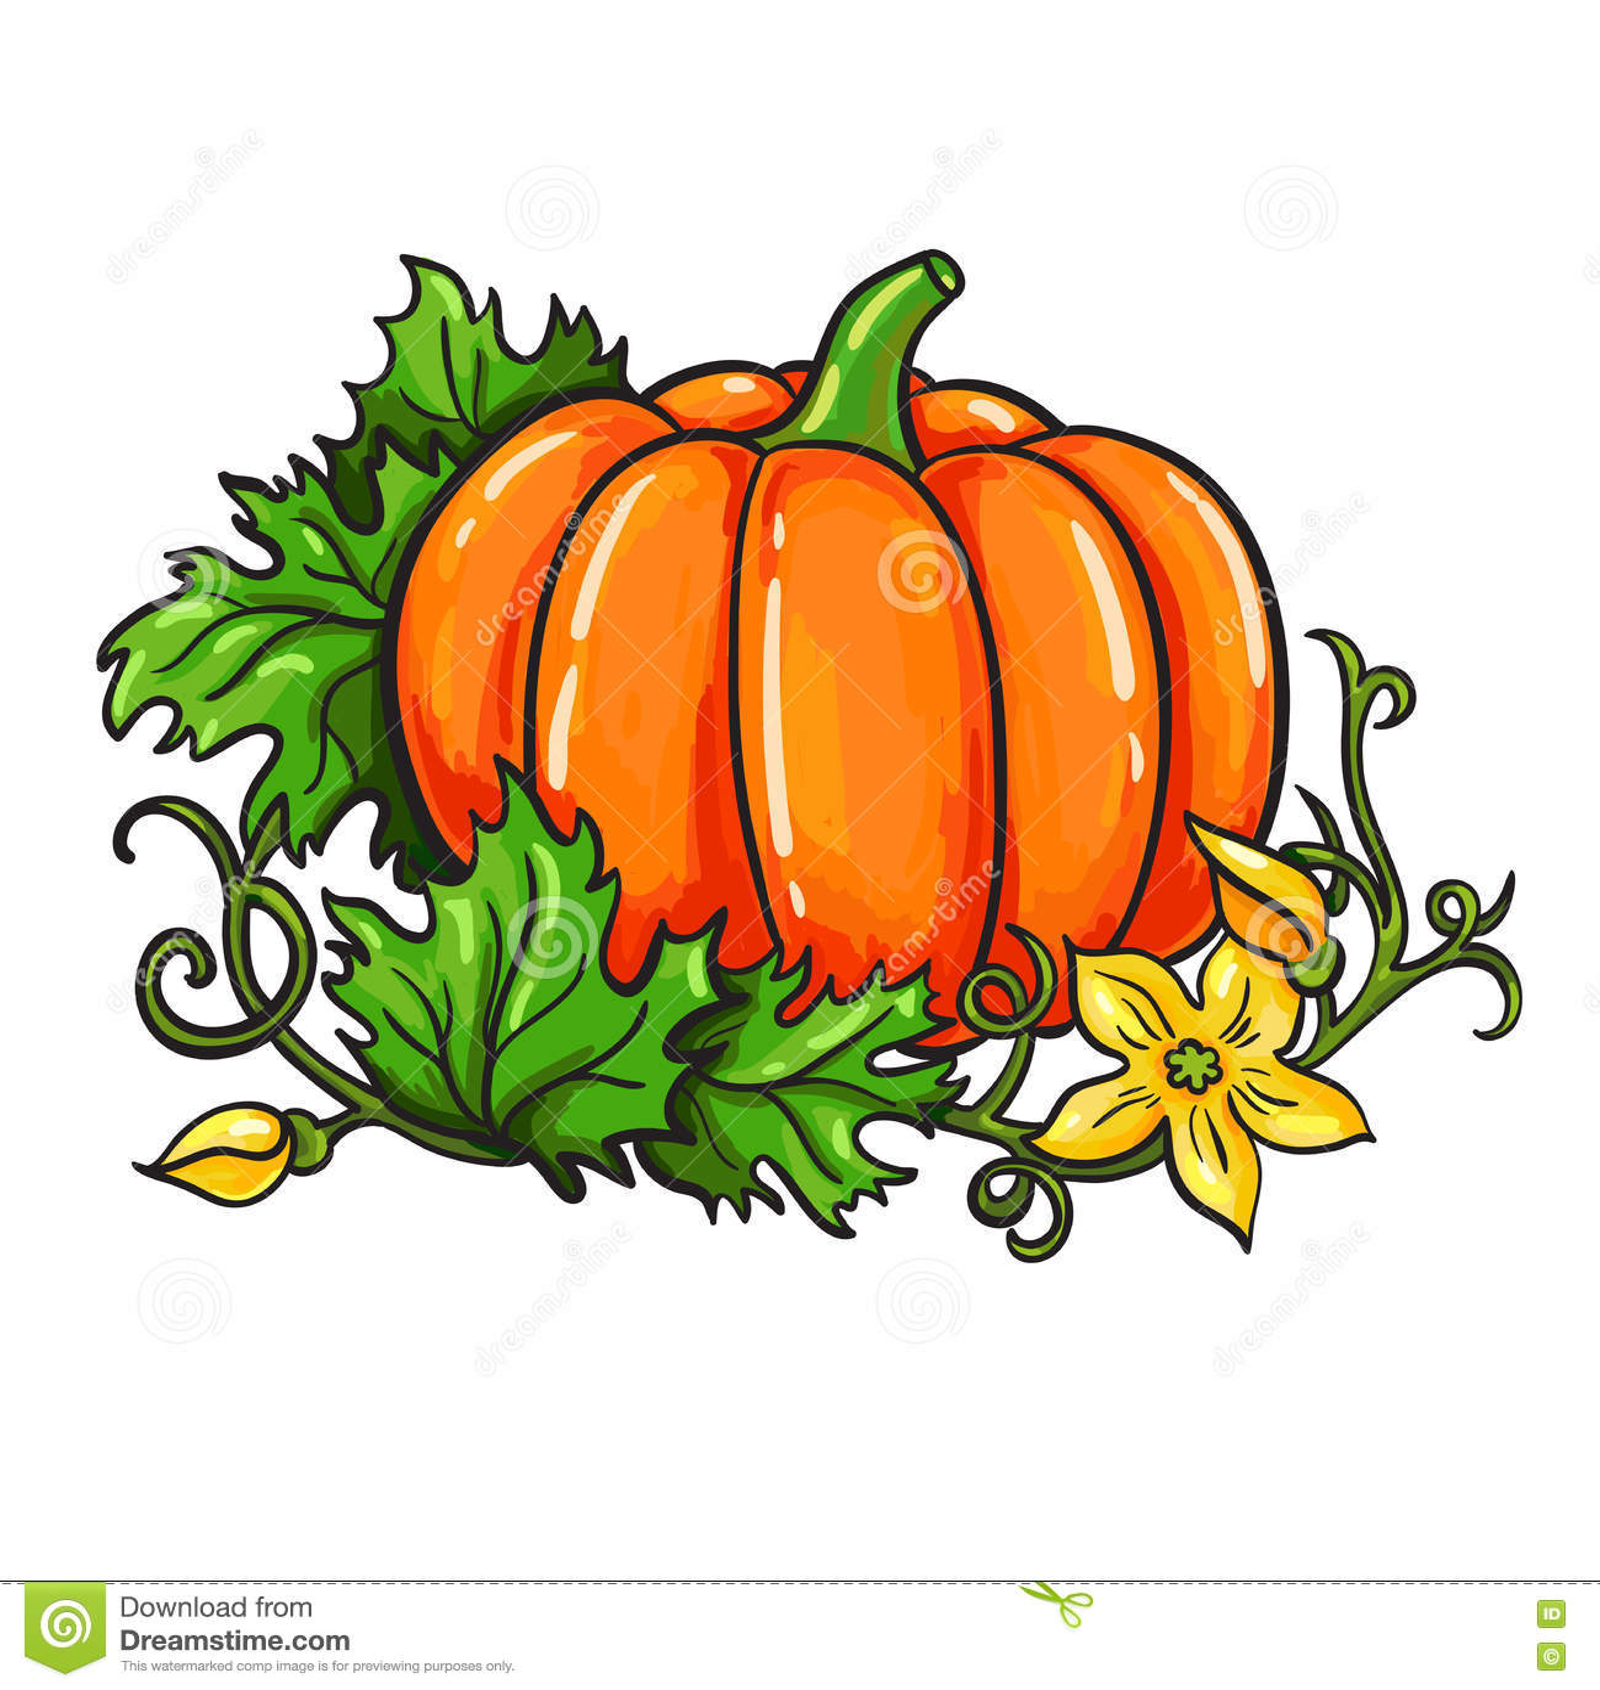 Pumpkin vector drawing. cartoon vegetable